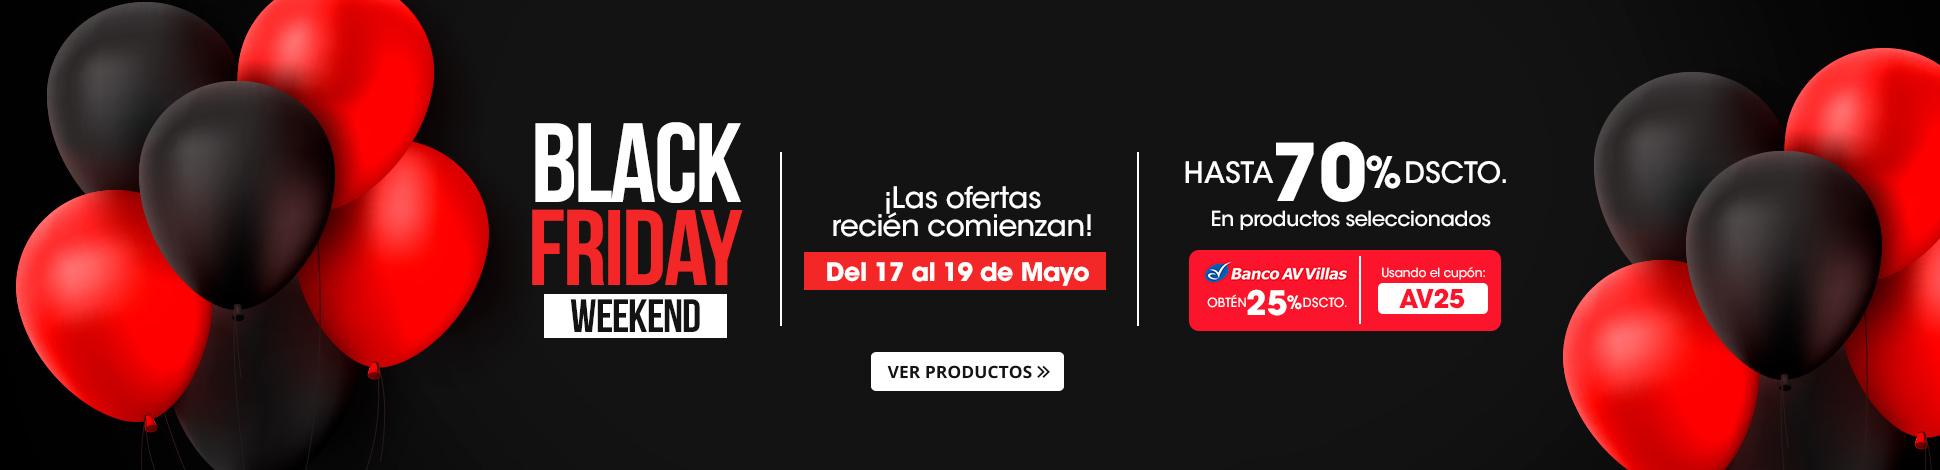 hs-black-friday-colombia.jpg | Juntoz.com